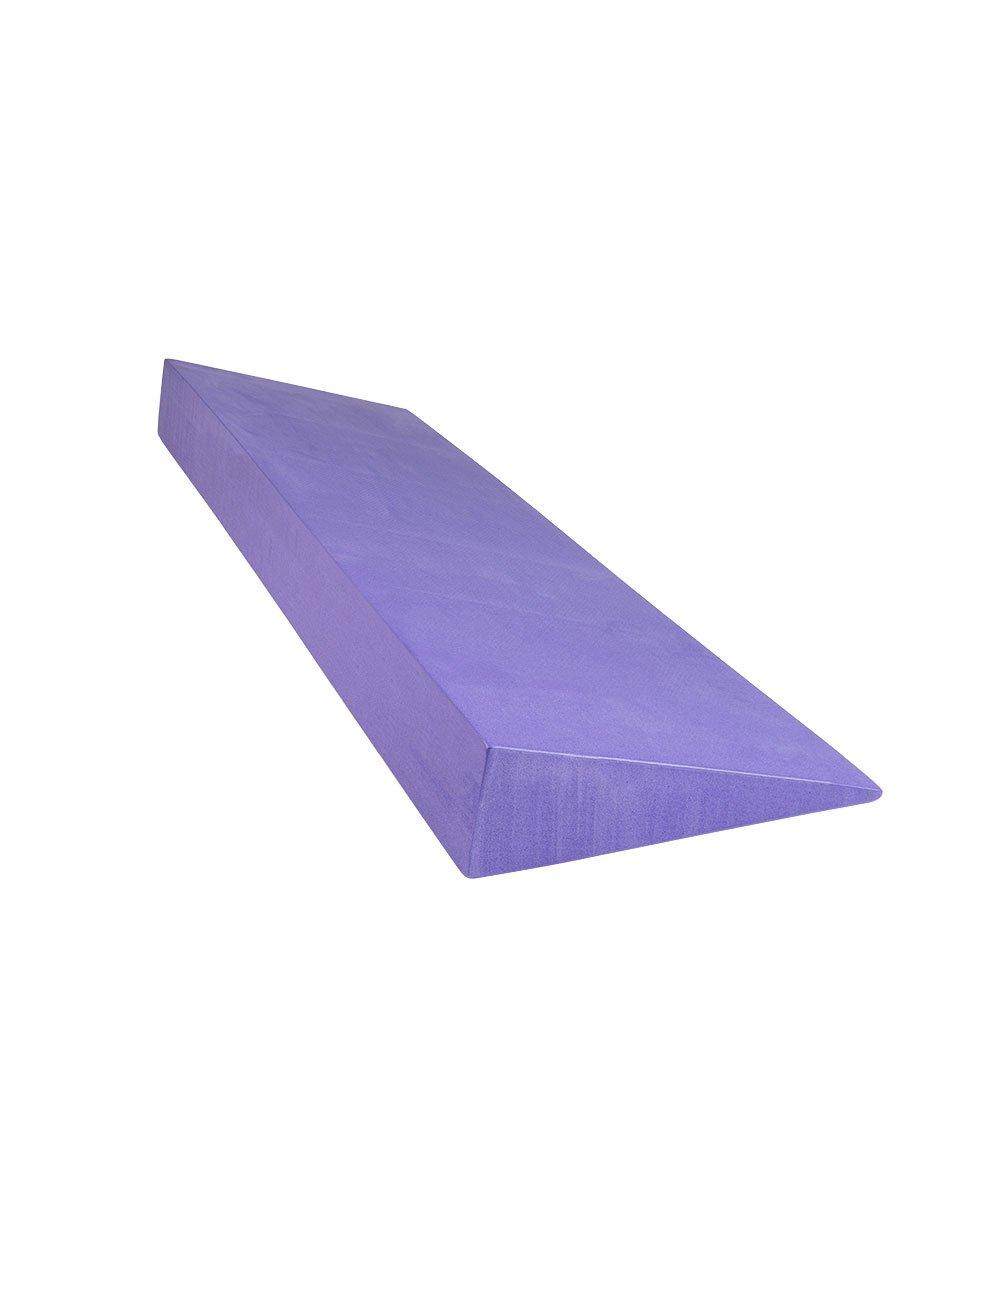 "Yoga Wedge: 6"" Wide X 20"" Long X 2"" Thick, Purple"